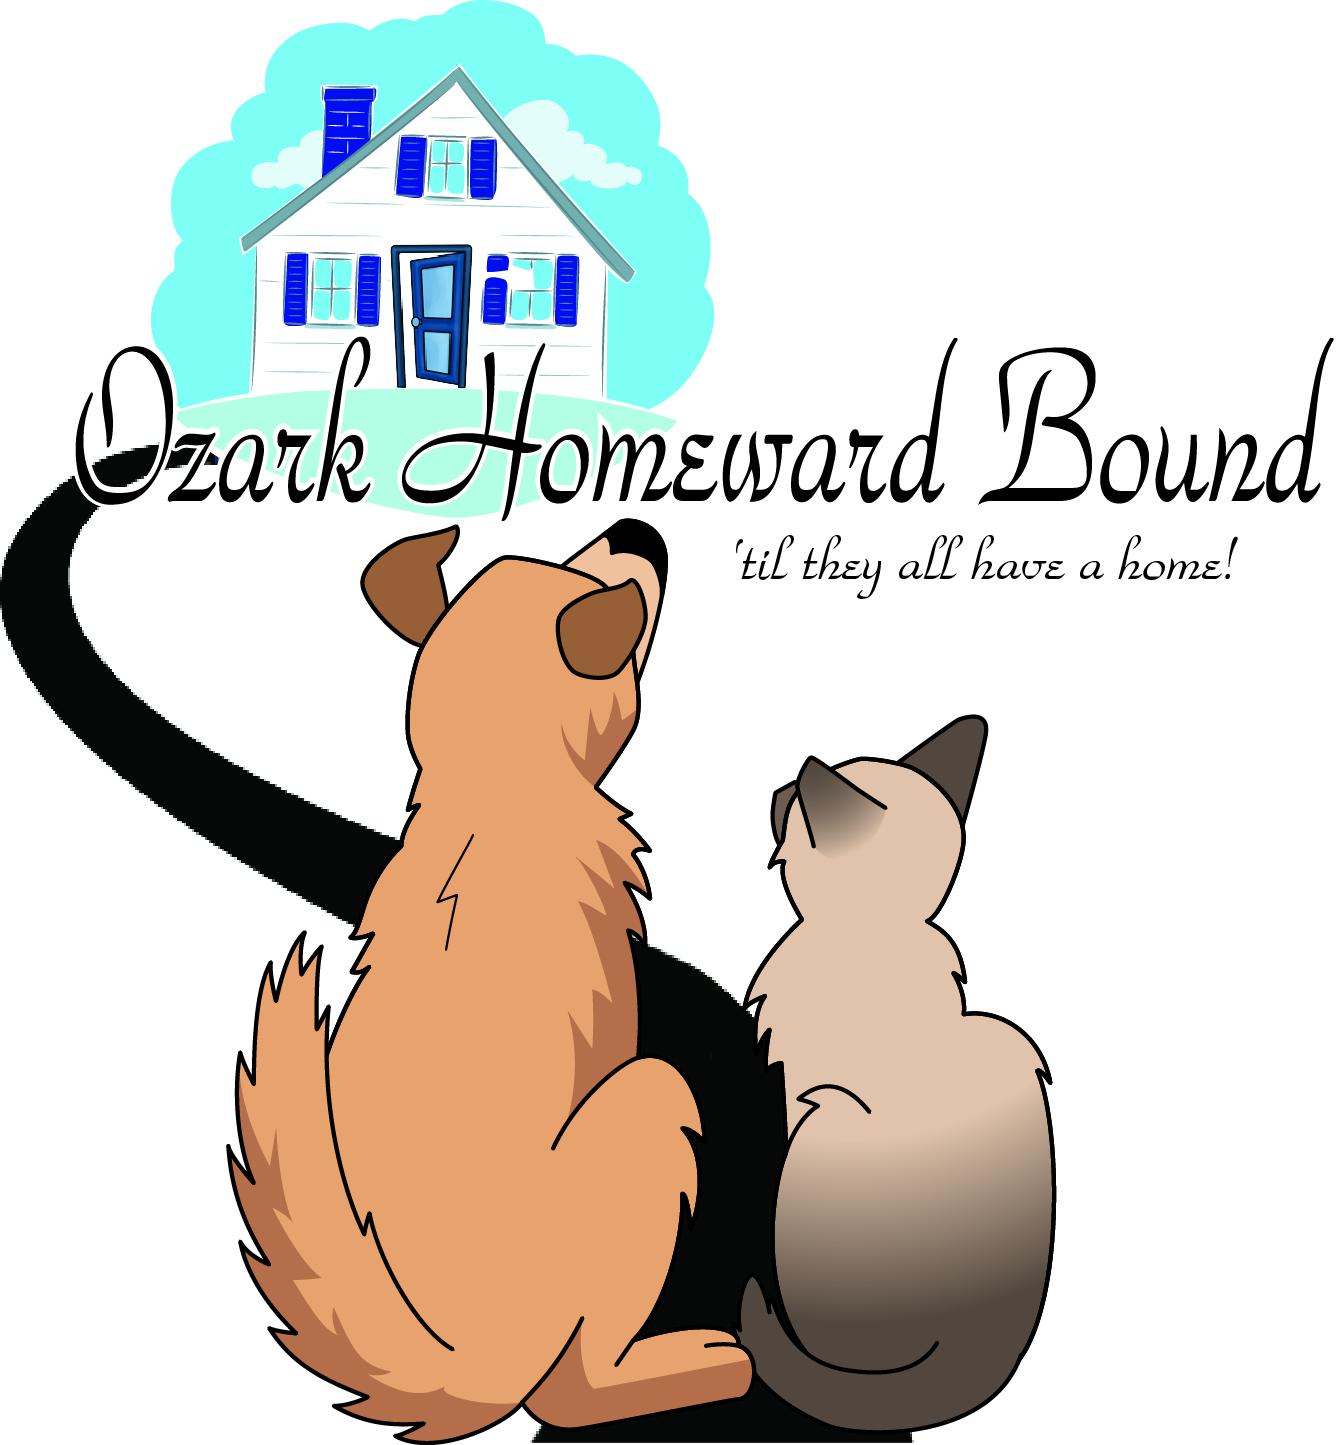 Ozark Homeward Bound.